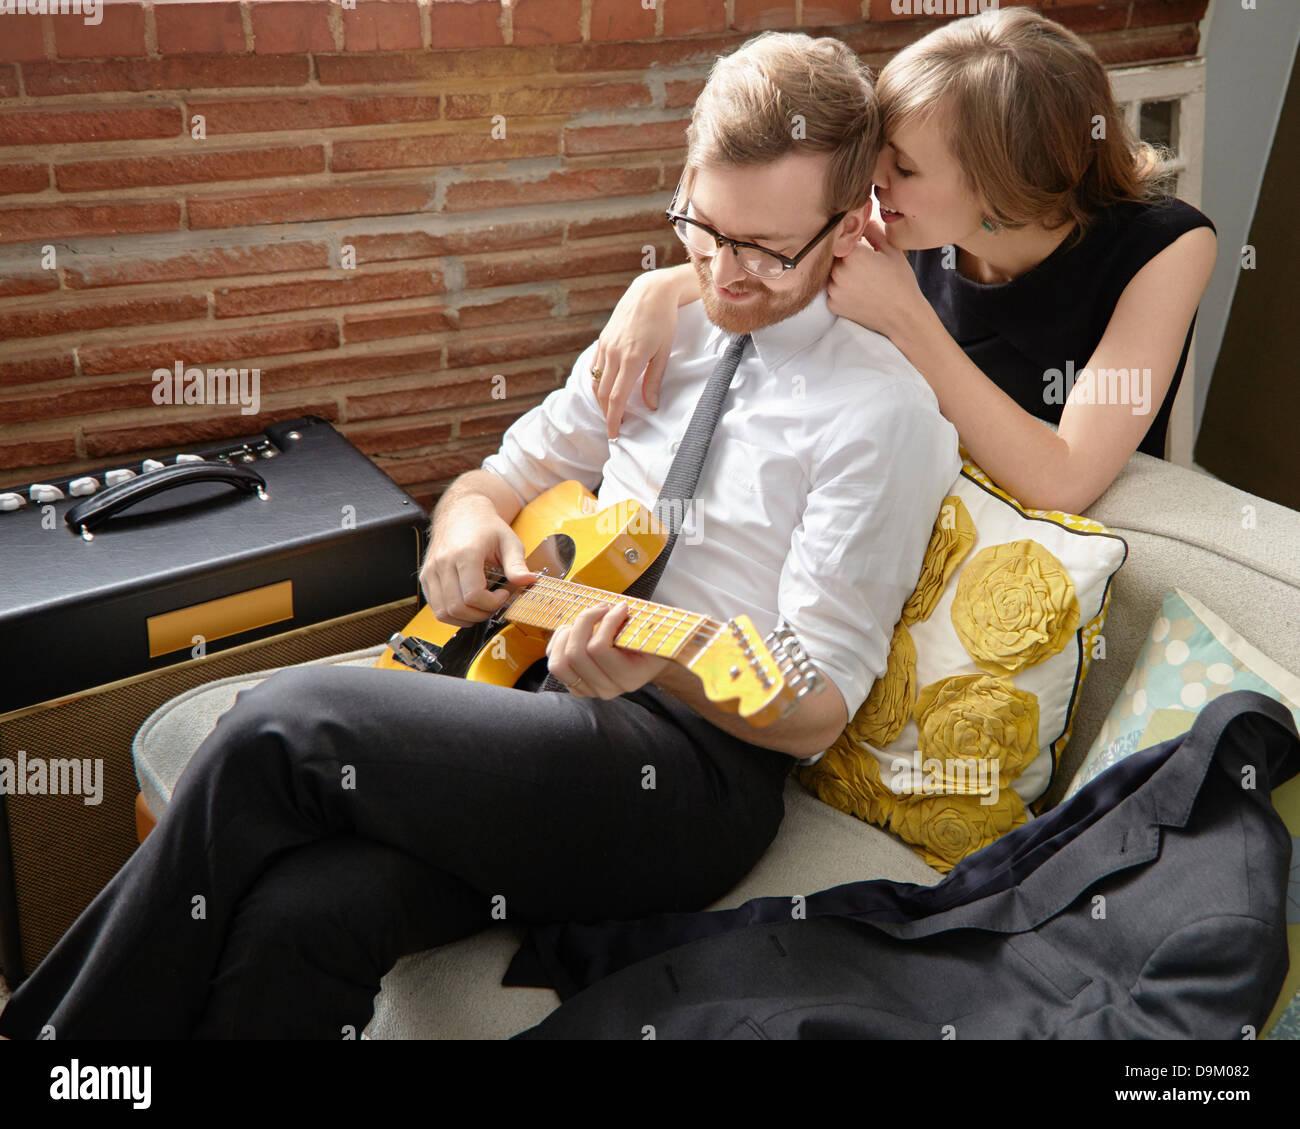 Junge Frau mit Partner üben auf e-Gitarre Stockbild